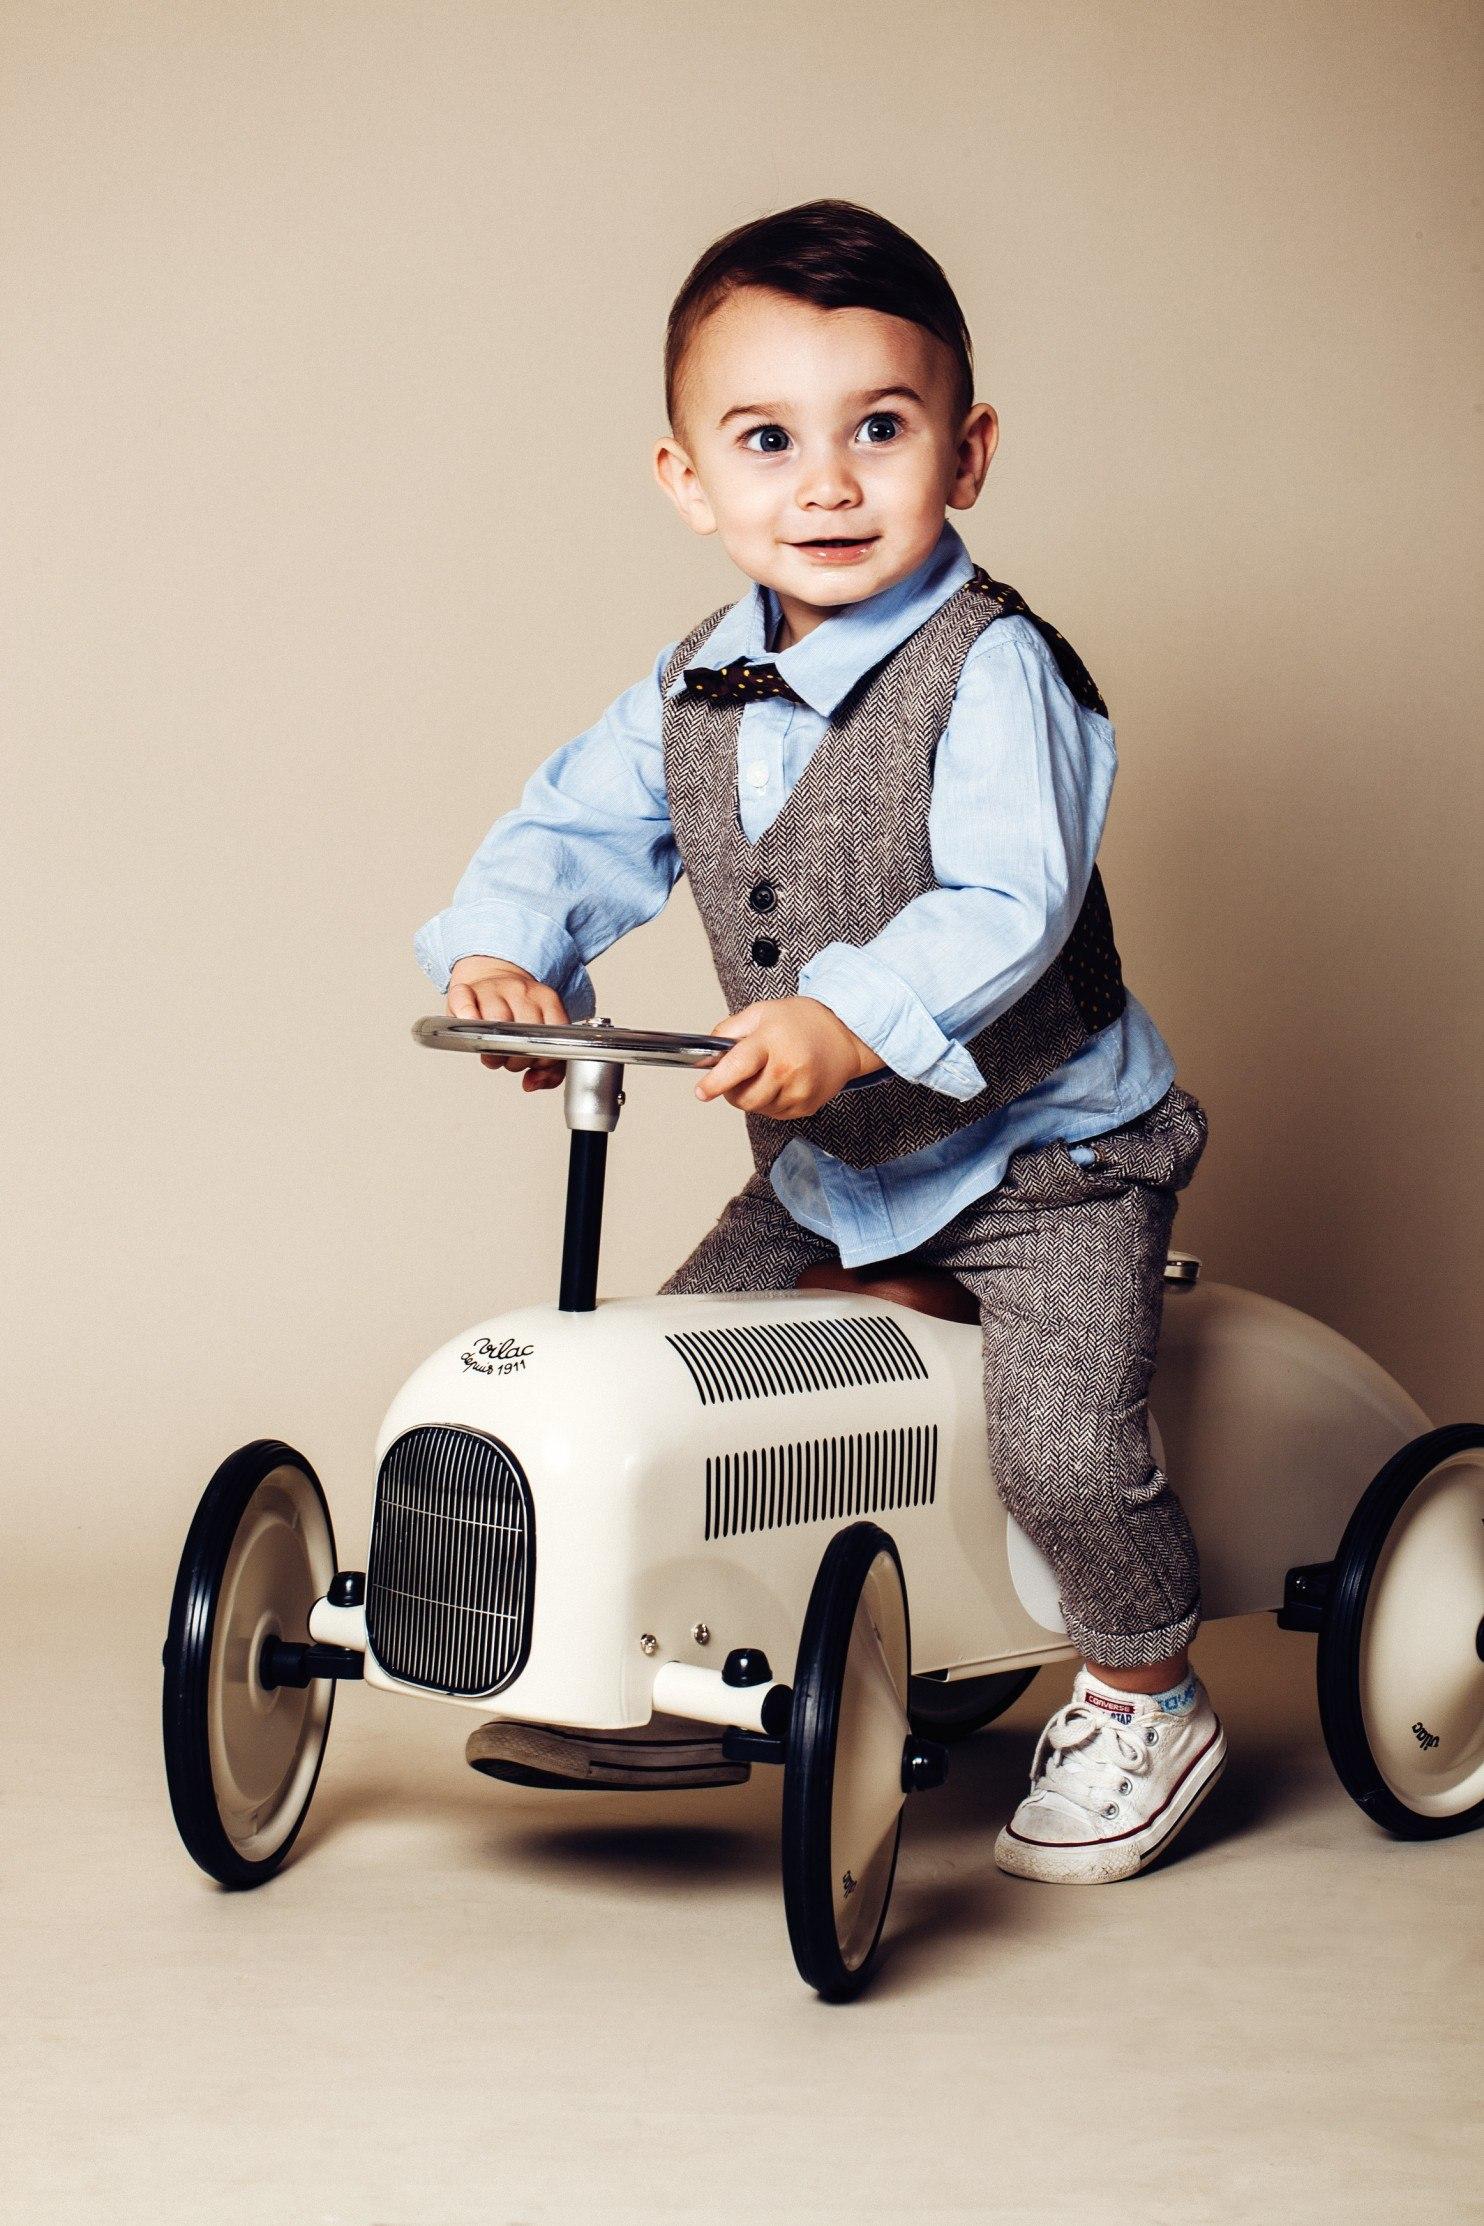 kids-children-fashion-photography-photographer-ruth-rose-west-london-rafi-12-1484x2226.jpg